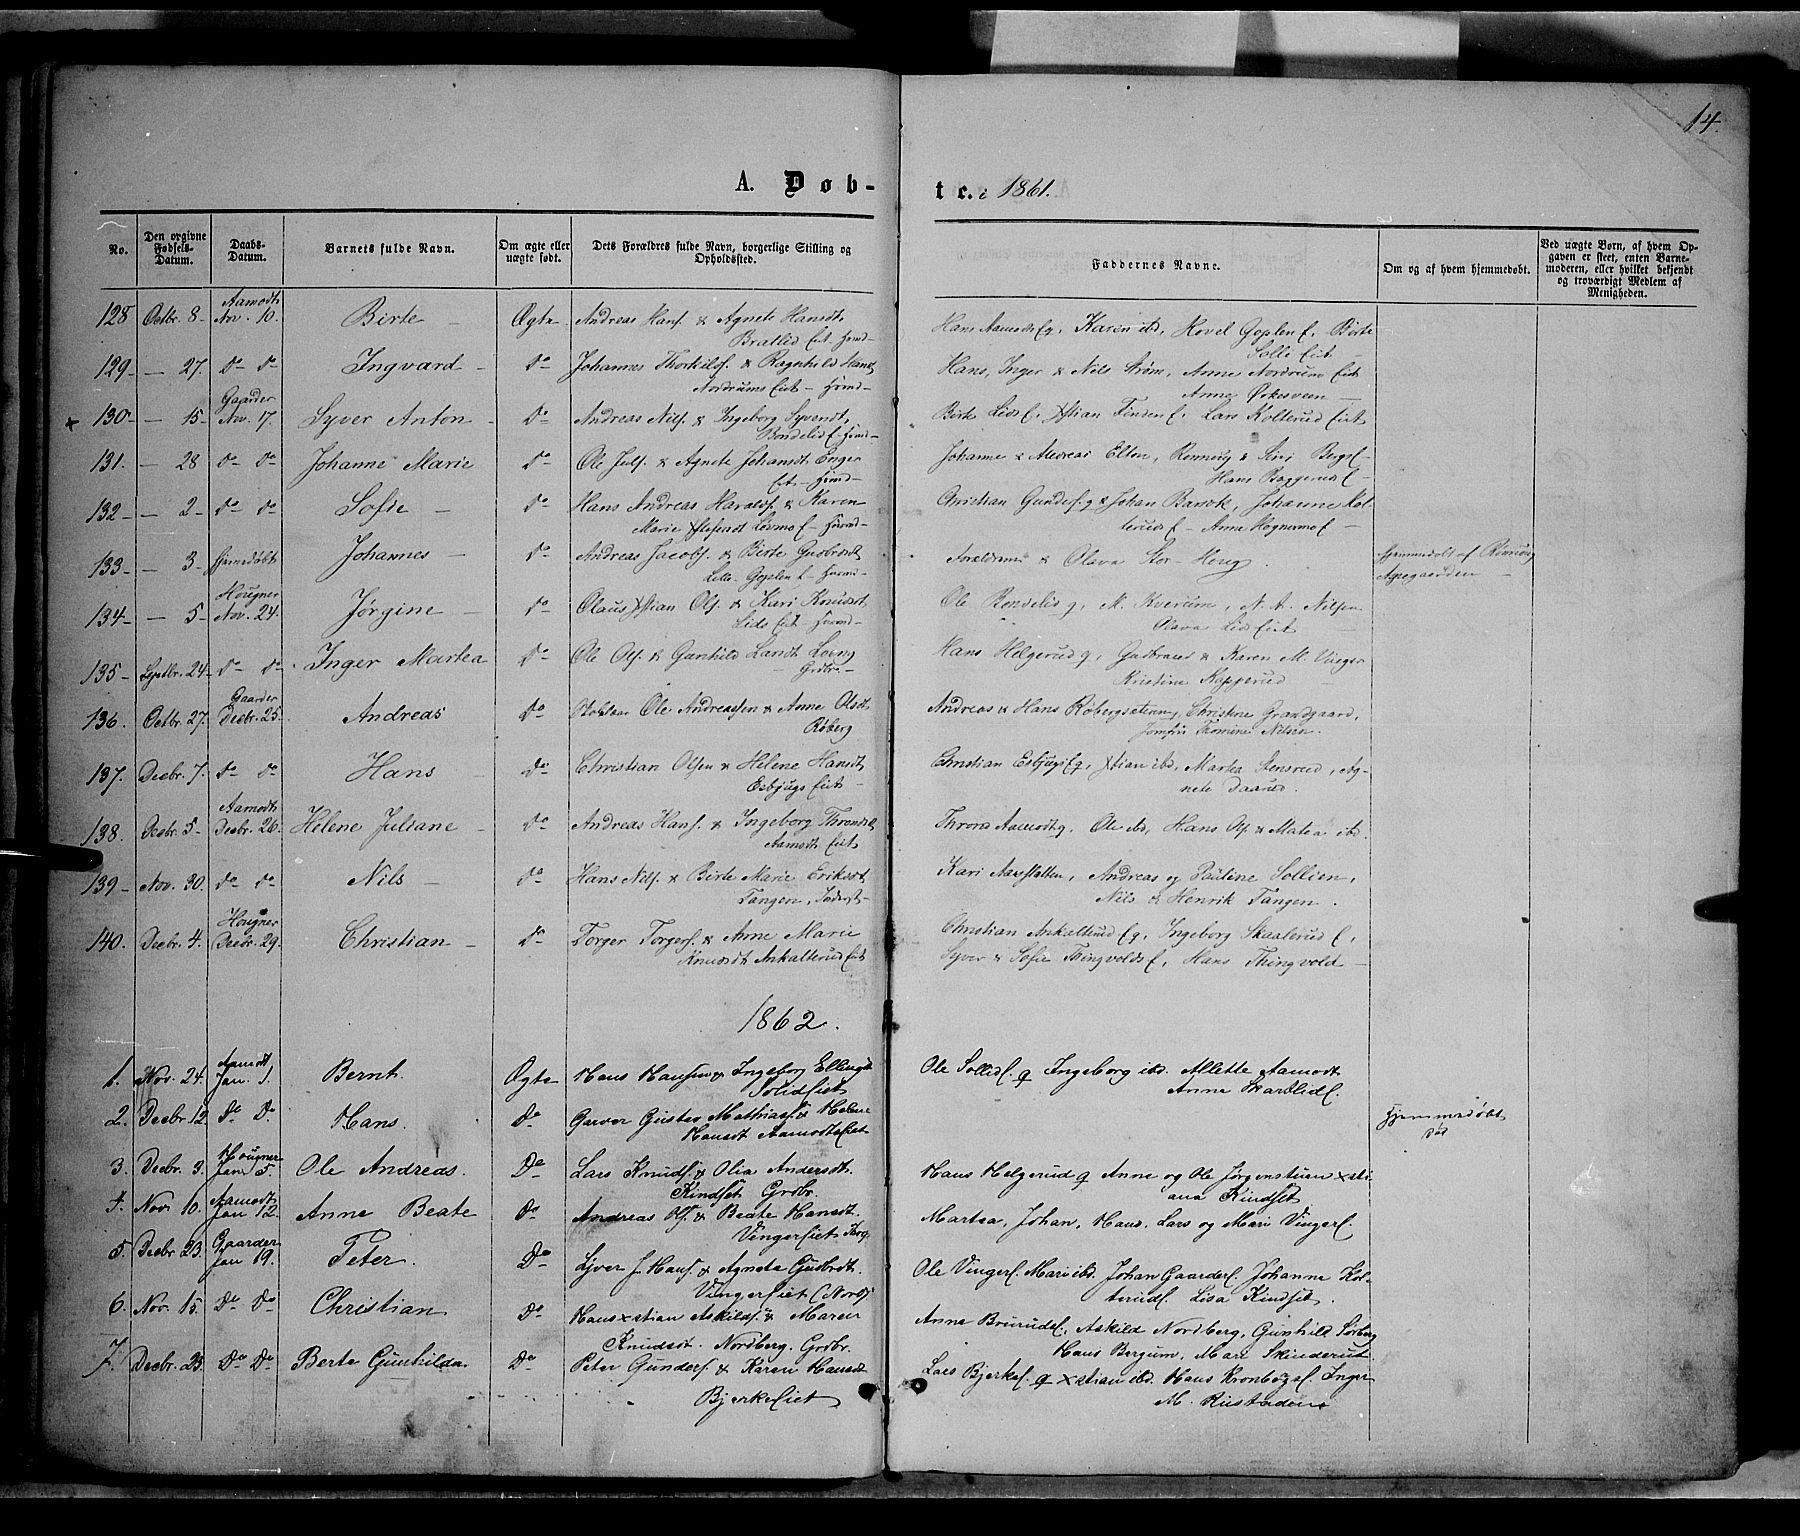 SAH, Nordre Land prestekontor, Ministerialbok nr. 1, 1860-1871, s. 14